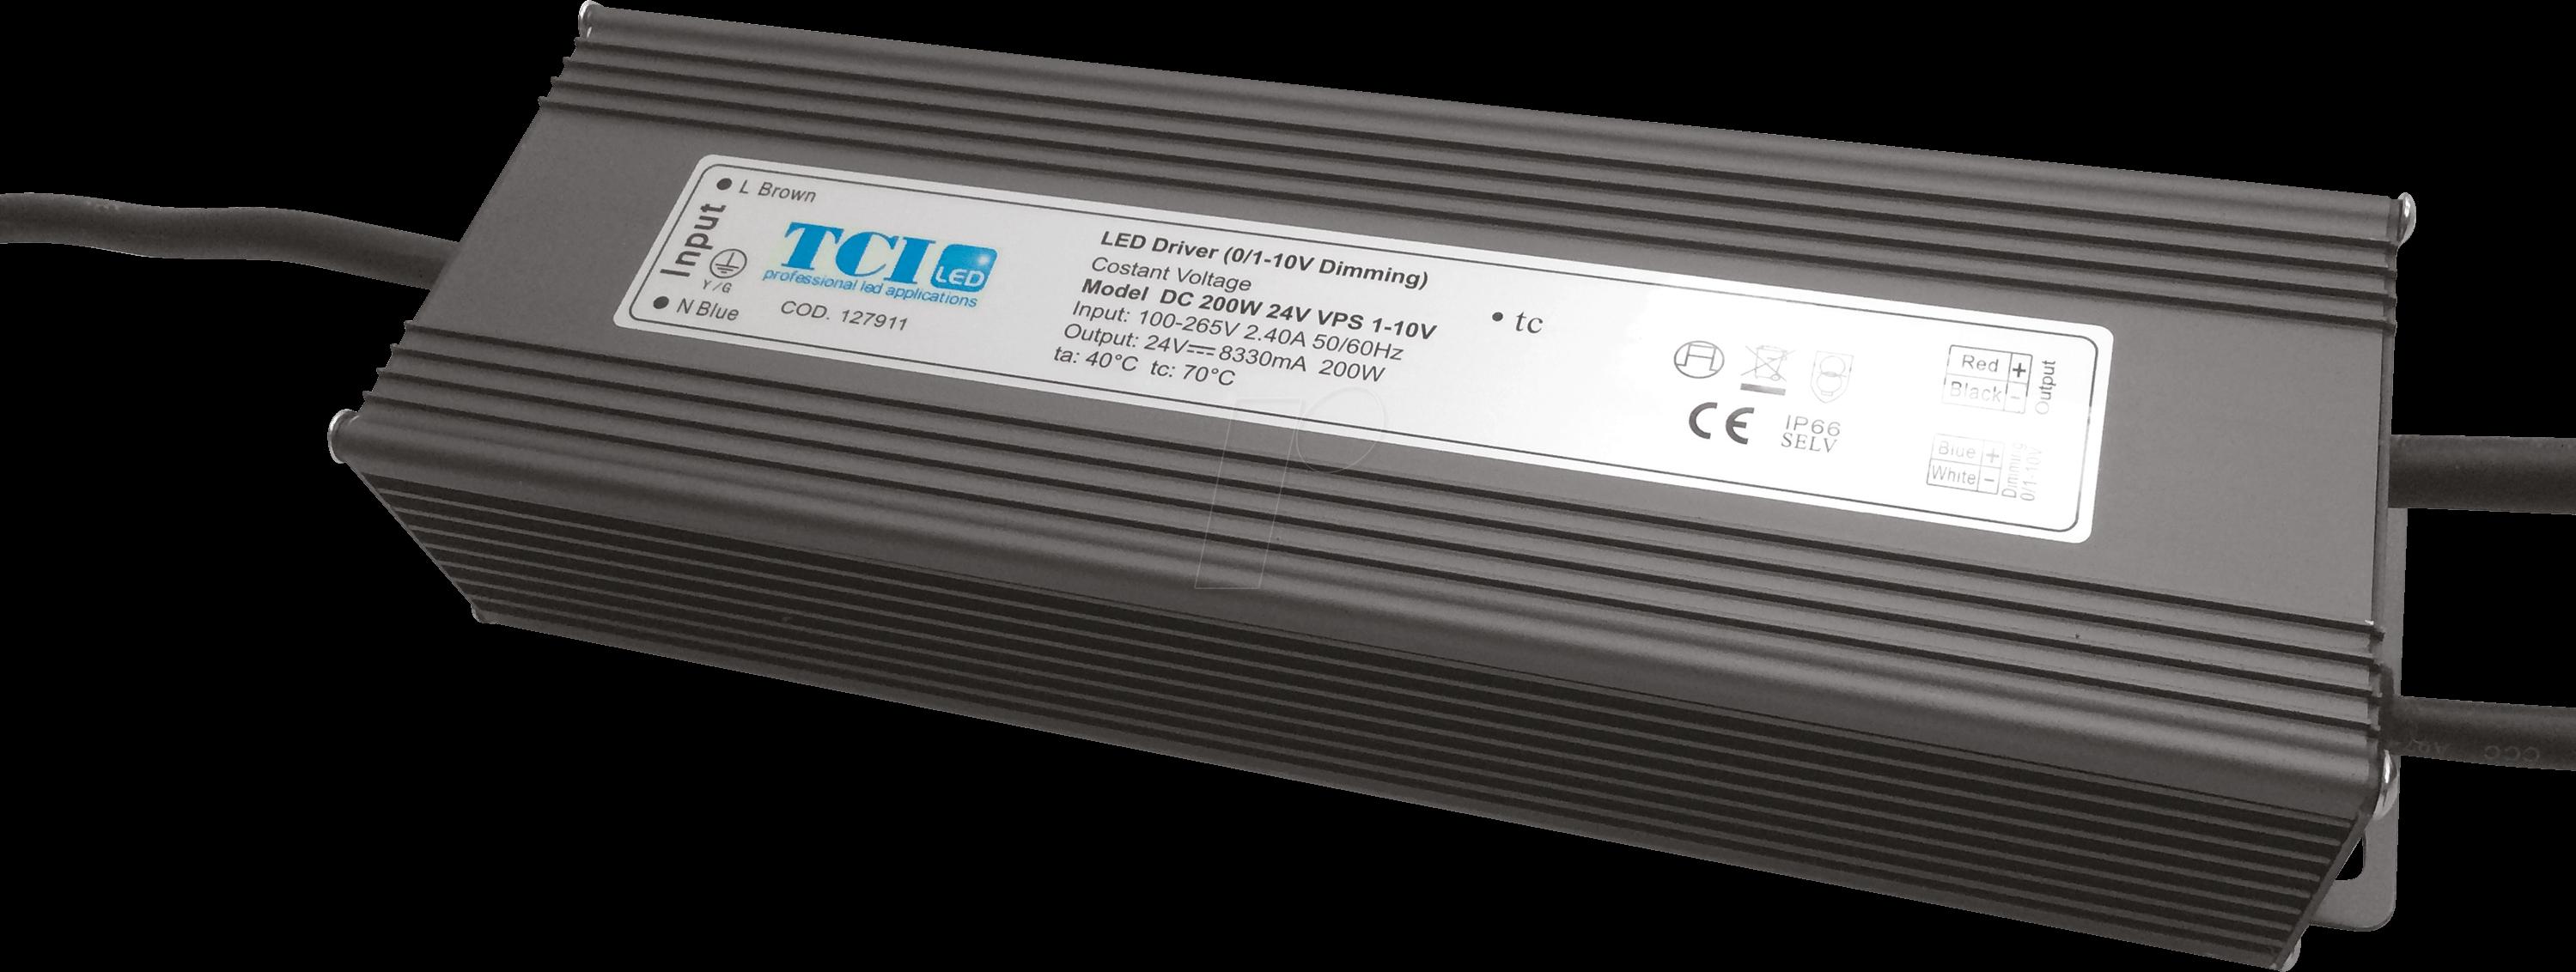 Vps 200 24 Power Supply W V Dc 8500 Ma At Reichelt Elektronik Volts Ac To Tci